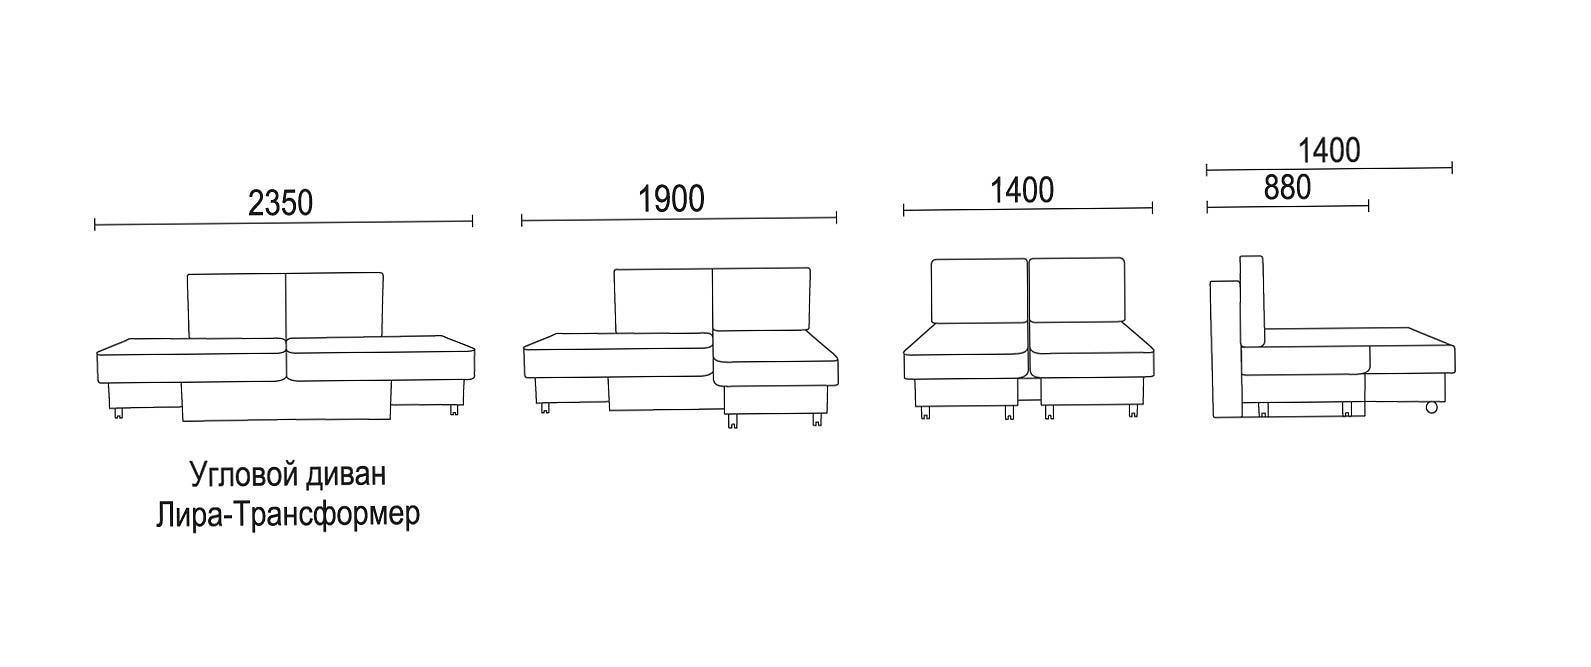 Схема-чертеж вариантов трансформаций дивана Лира-трансформер Боровичи